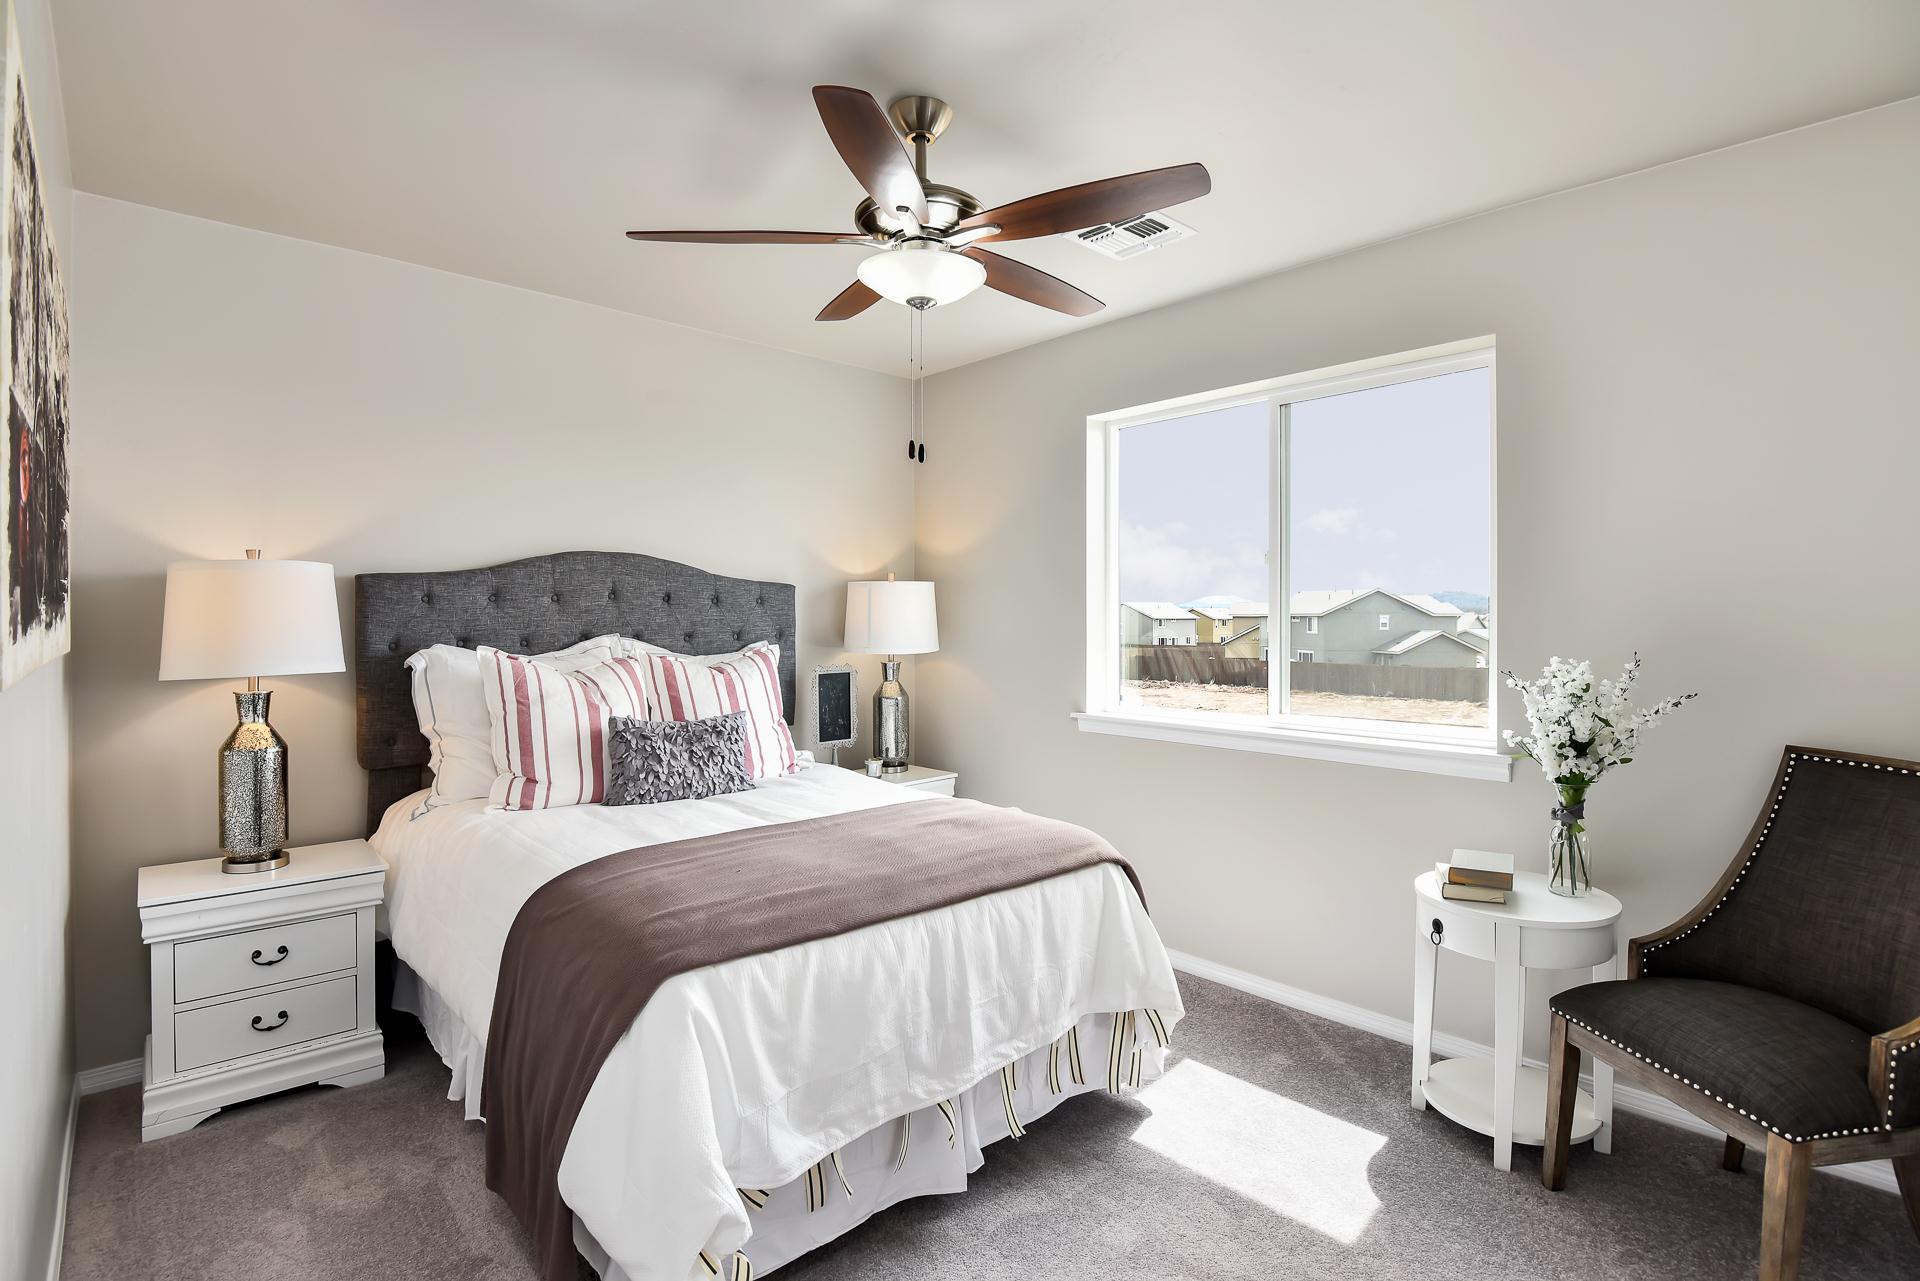 'Flagstaff Meadows' by Capstone Homes AZ in Flagstaff